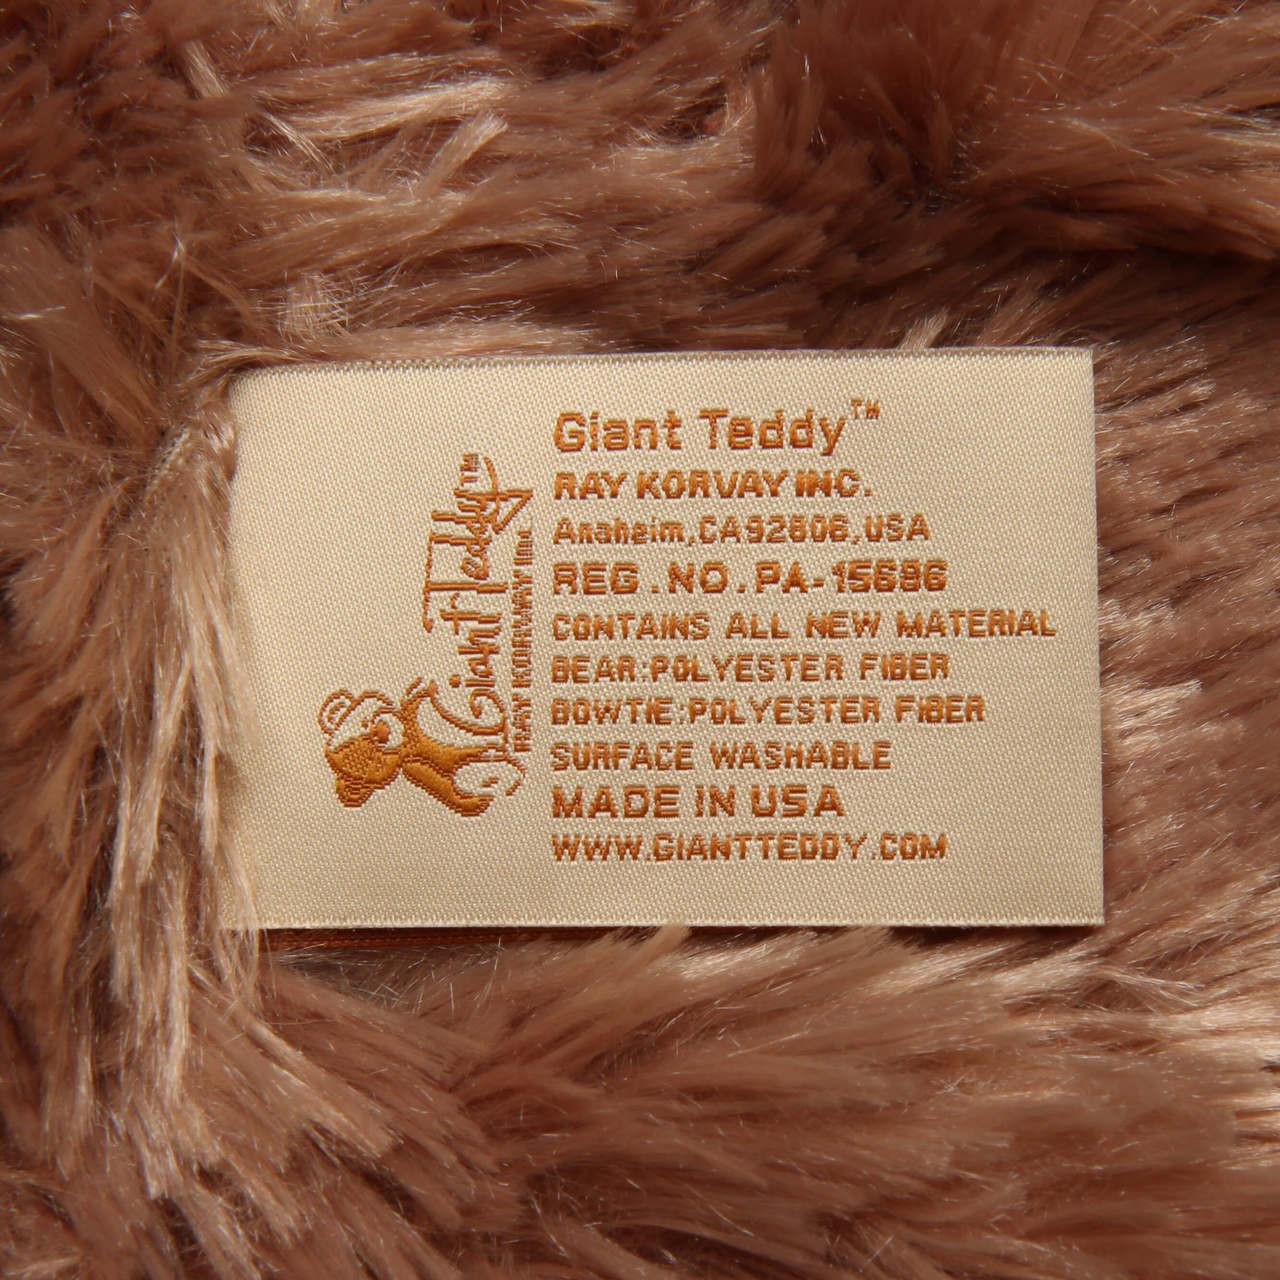 Giant Teddy Tag 2017